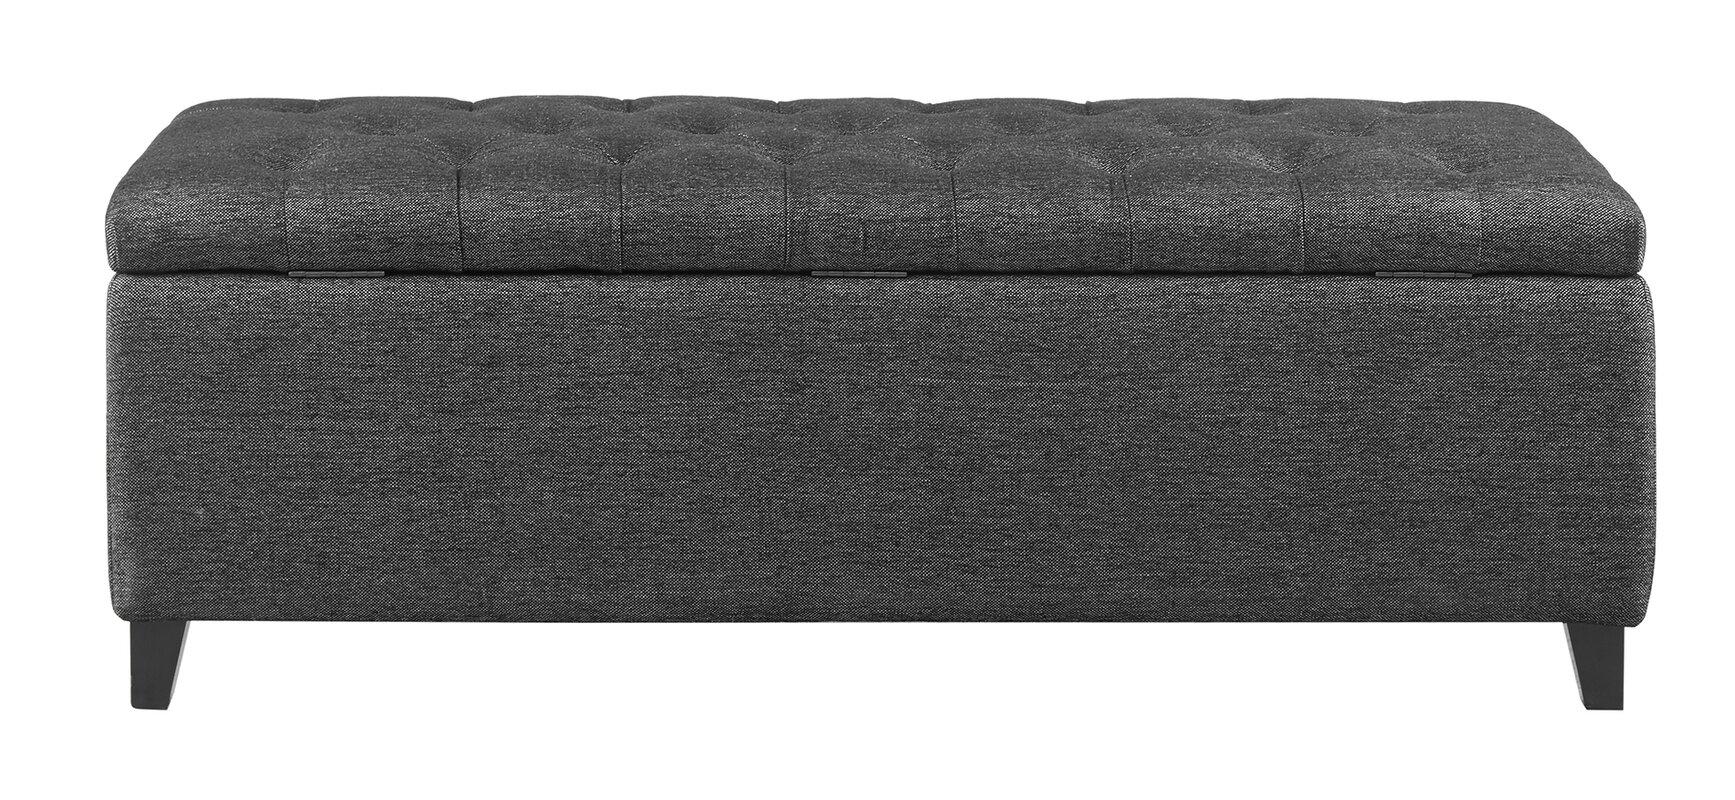 holoman upholstered storage bench. alcott hill holoman upholstered storage bench  reviews  wayfair